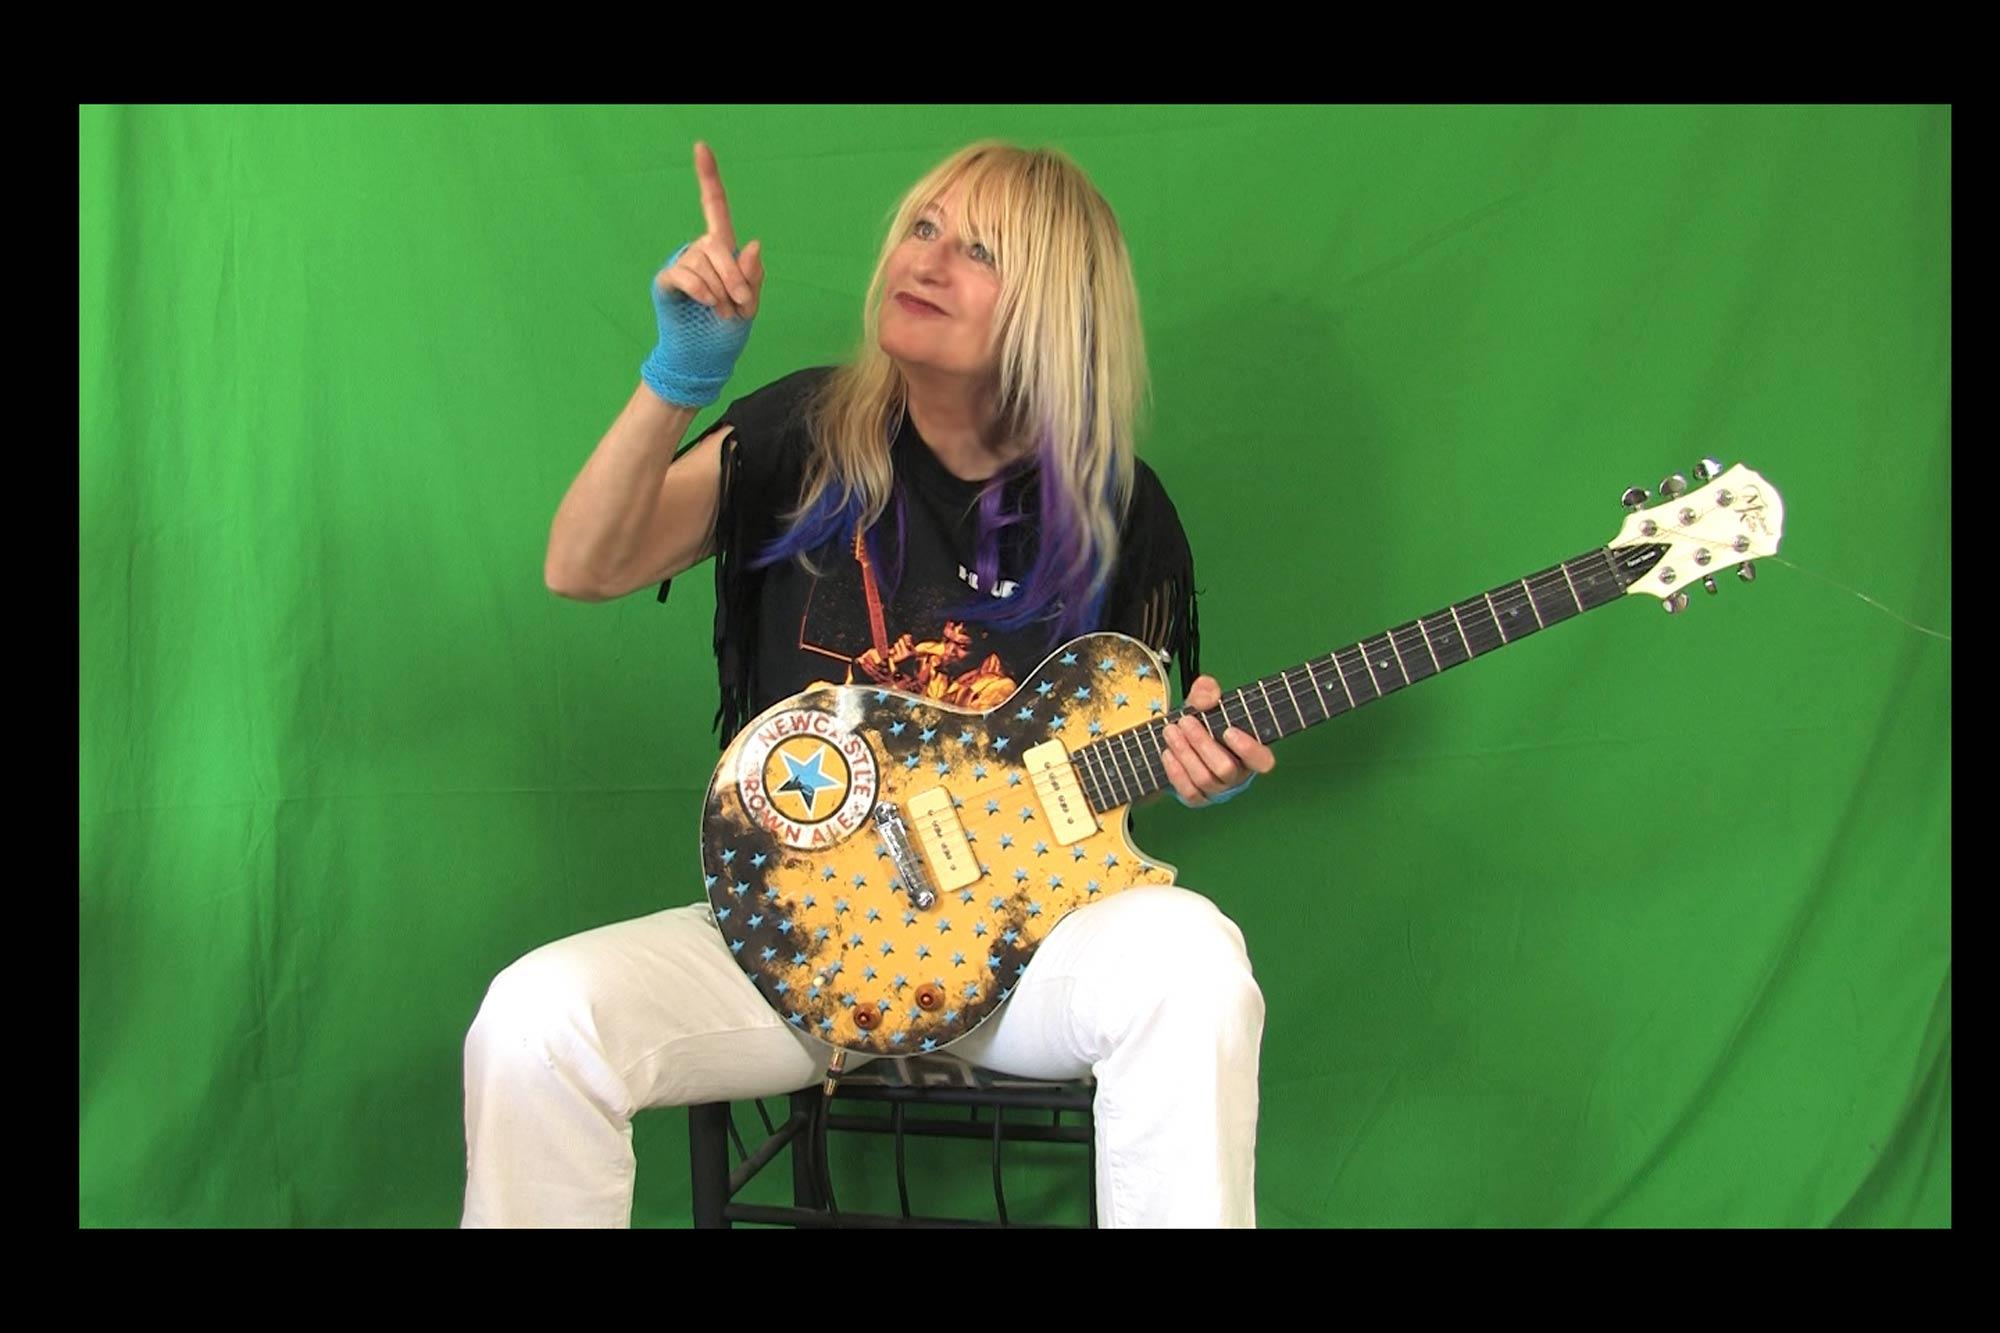 Blues Guitar with Female Guitarist Shredmistress Rynata